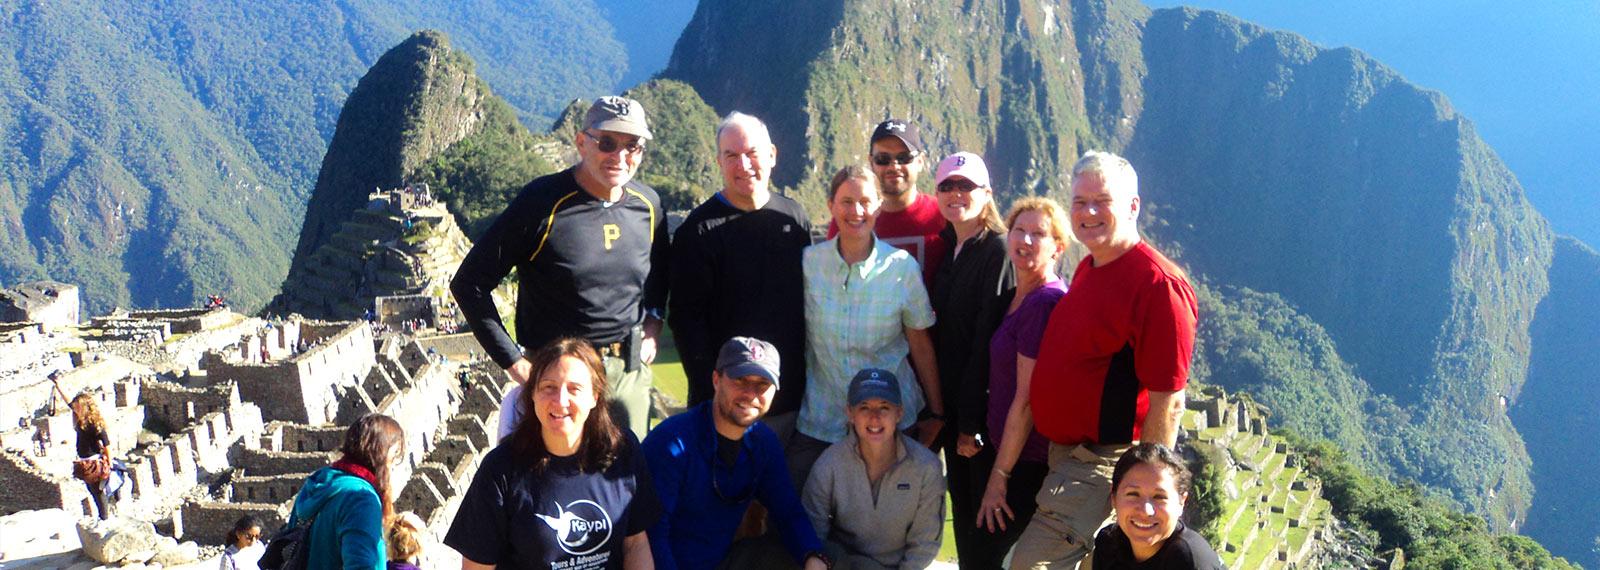 kaypi peru tours team on the inca trail